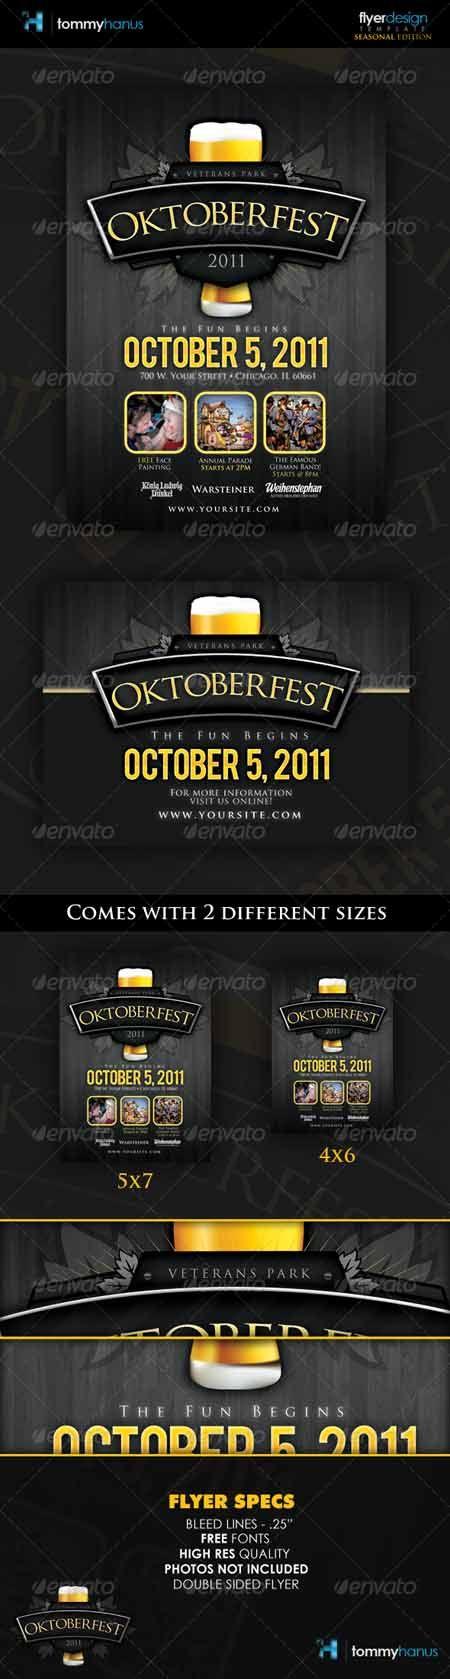 23 best beer images on Pinterest Flyer template, Print templates - event brochure template